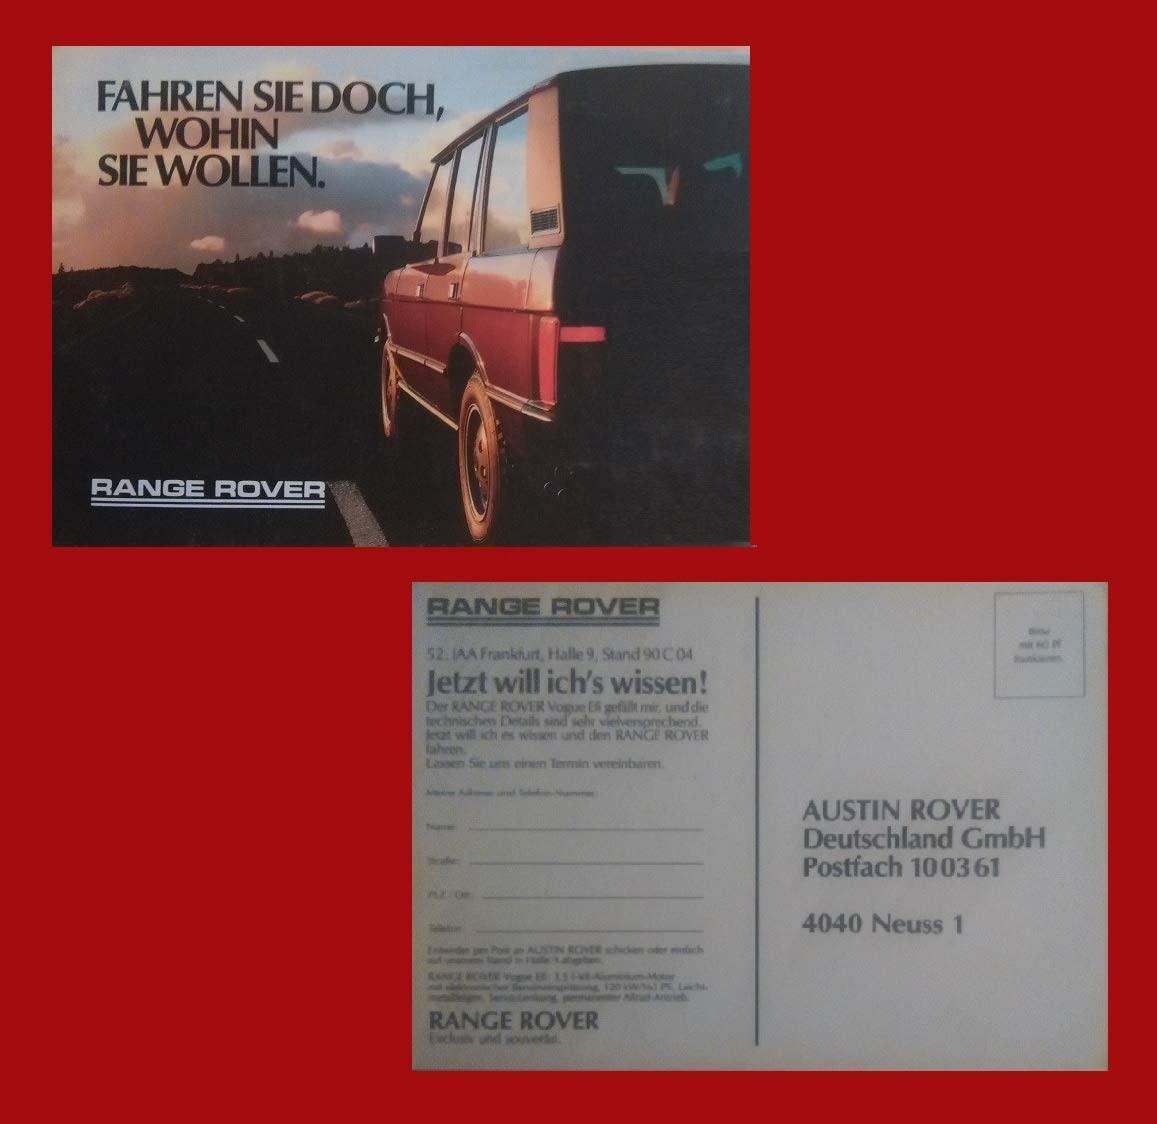 1987-88 LAND ROVER RANGE ROVER VOGUE Efi FACTORY ORIGINAL COLOR POSTCARD - GERMANY - GREAT VINTAGE POST CARD !!